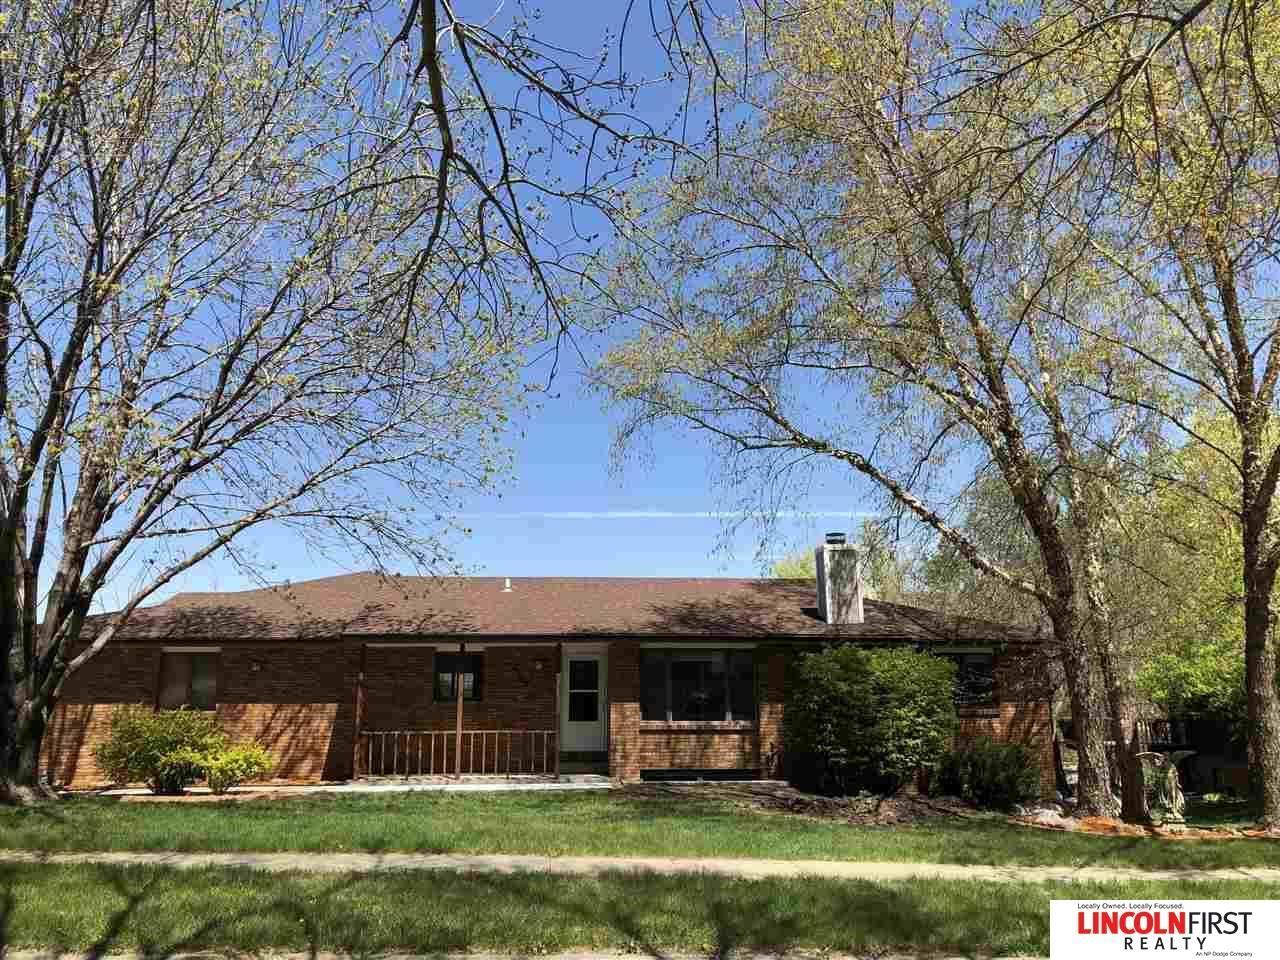 4100 Boulder Drive, Lincoln, NE 68516 - MLS#: 22121819